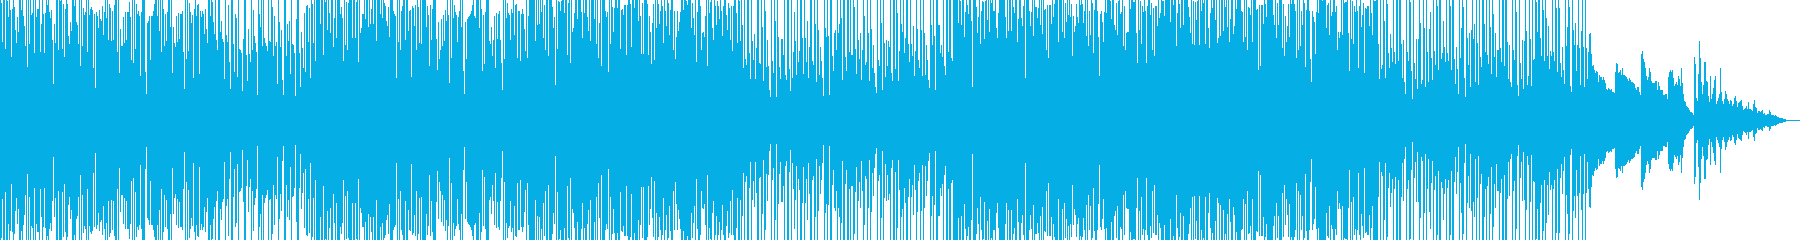 【CM】疾走感溢れるフューチャーハウスの再生済みの波形